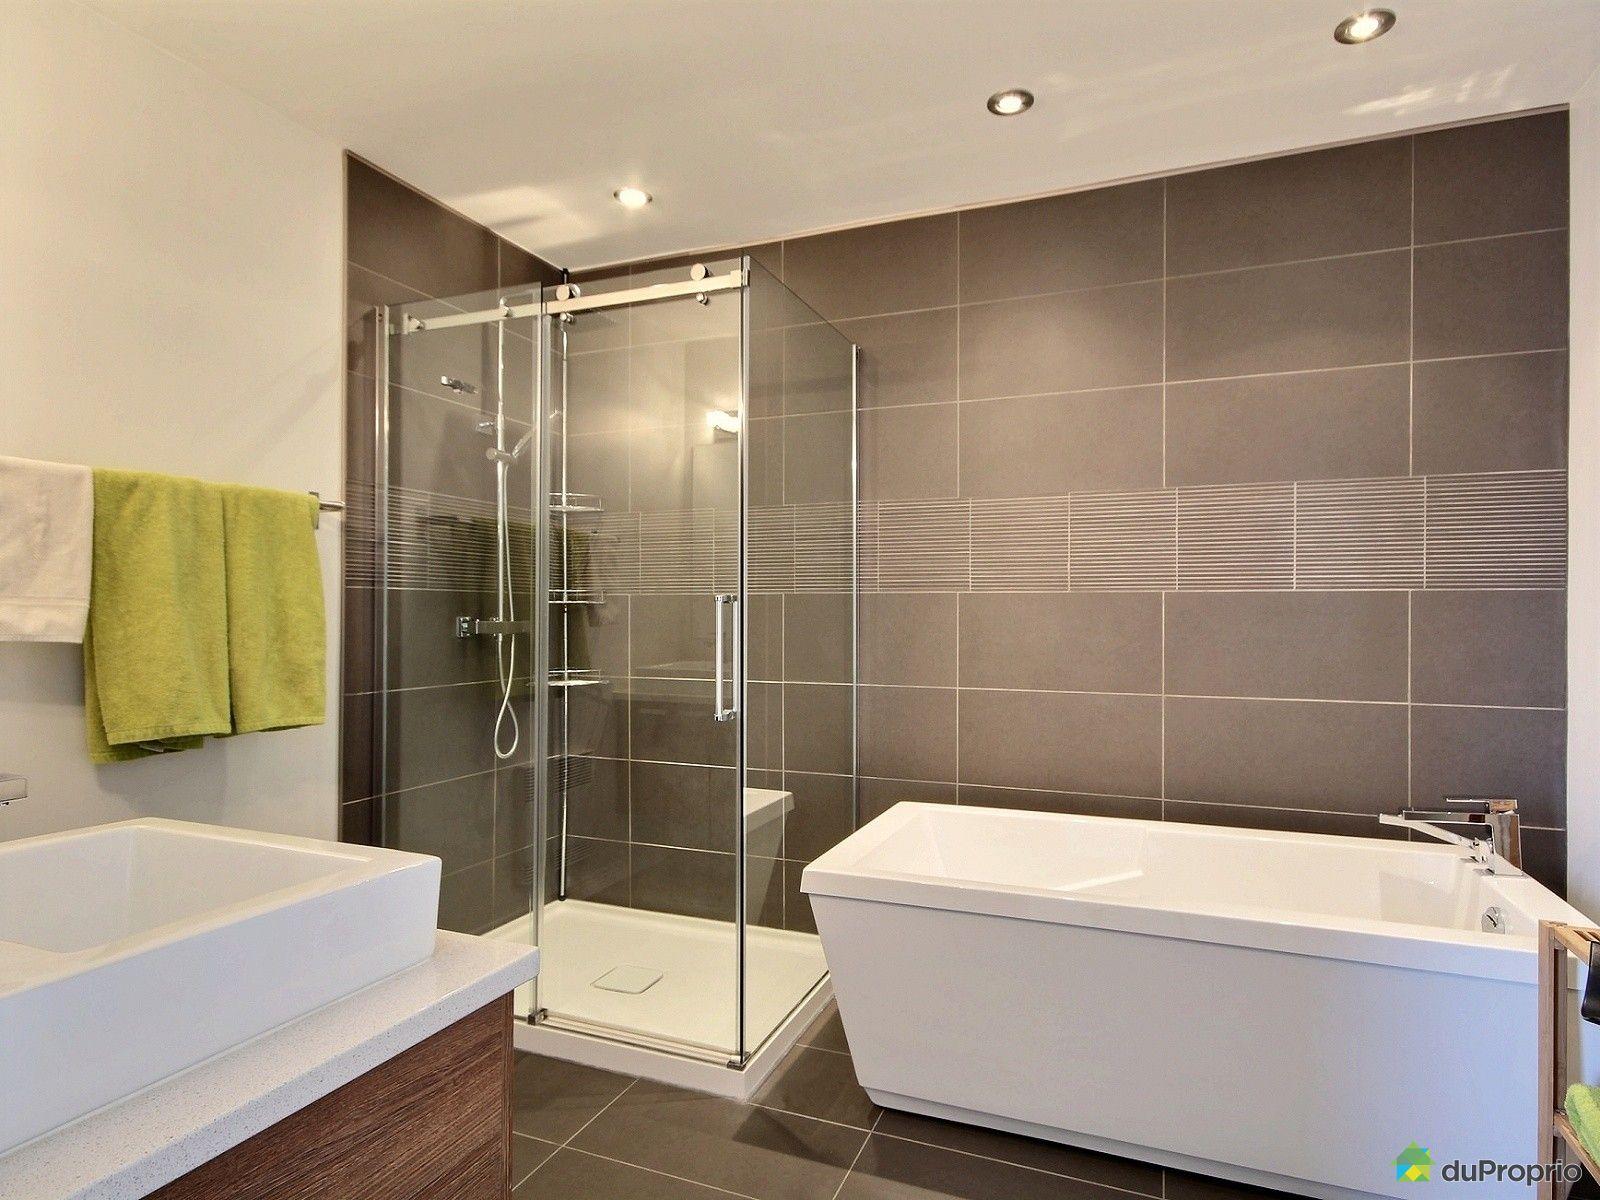 #90833B Maison Vendu Montréal Immobilier Québec DuProprio 576425 2729 petite salle de bain grande douche 1600x1200 px @ aertt.com